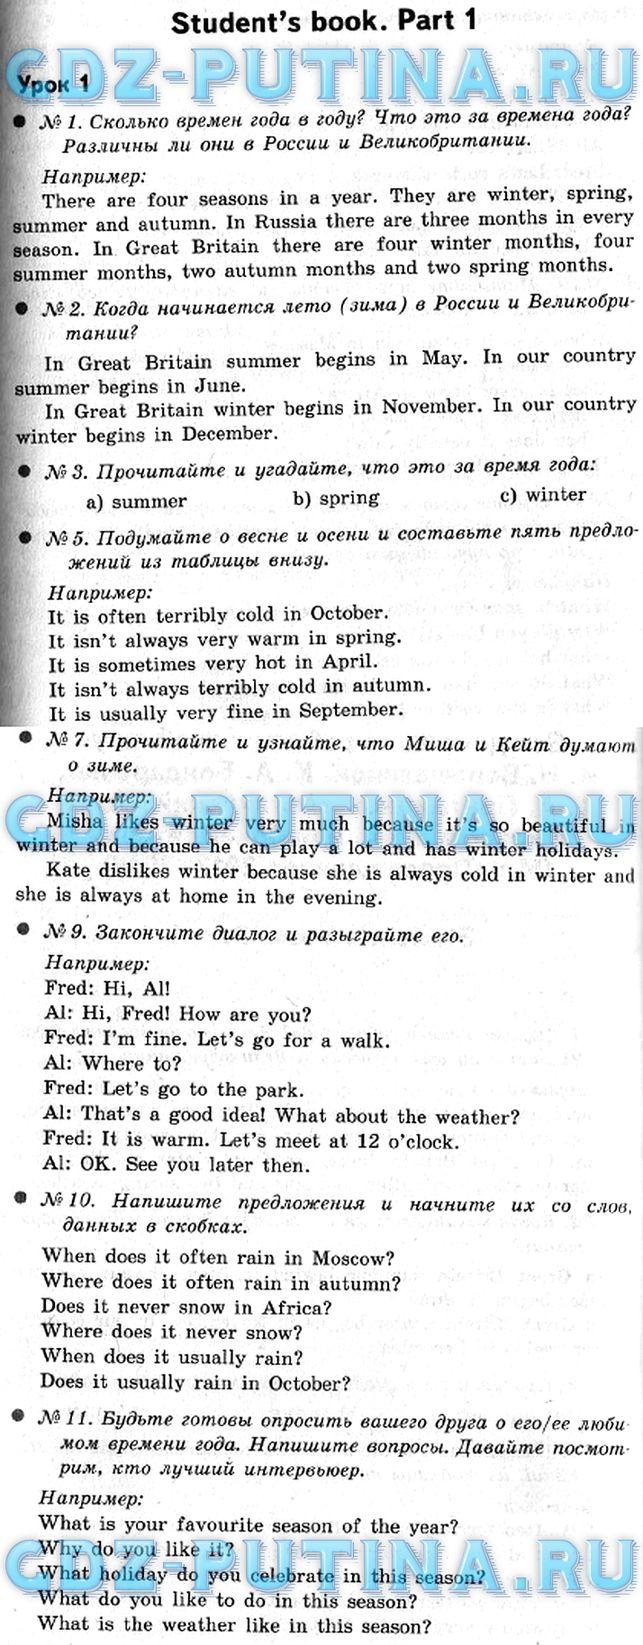 гдз по английскому языку 4 класс Афанасьева, Михеева.